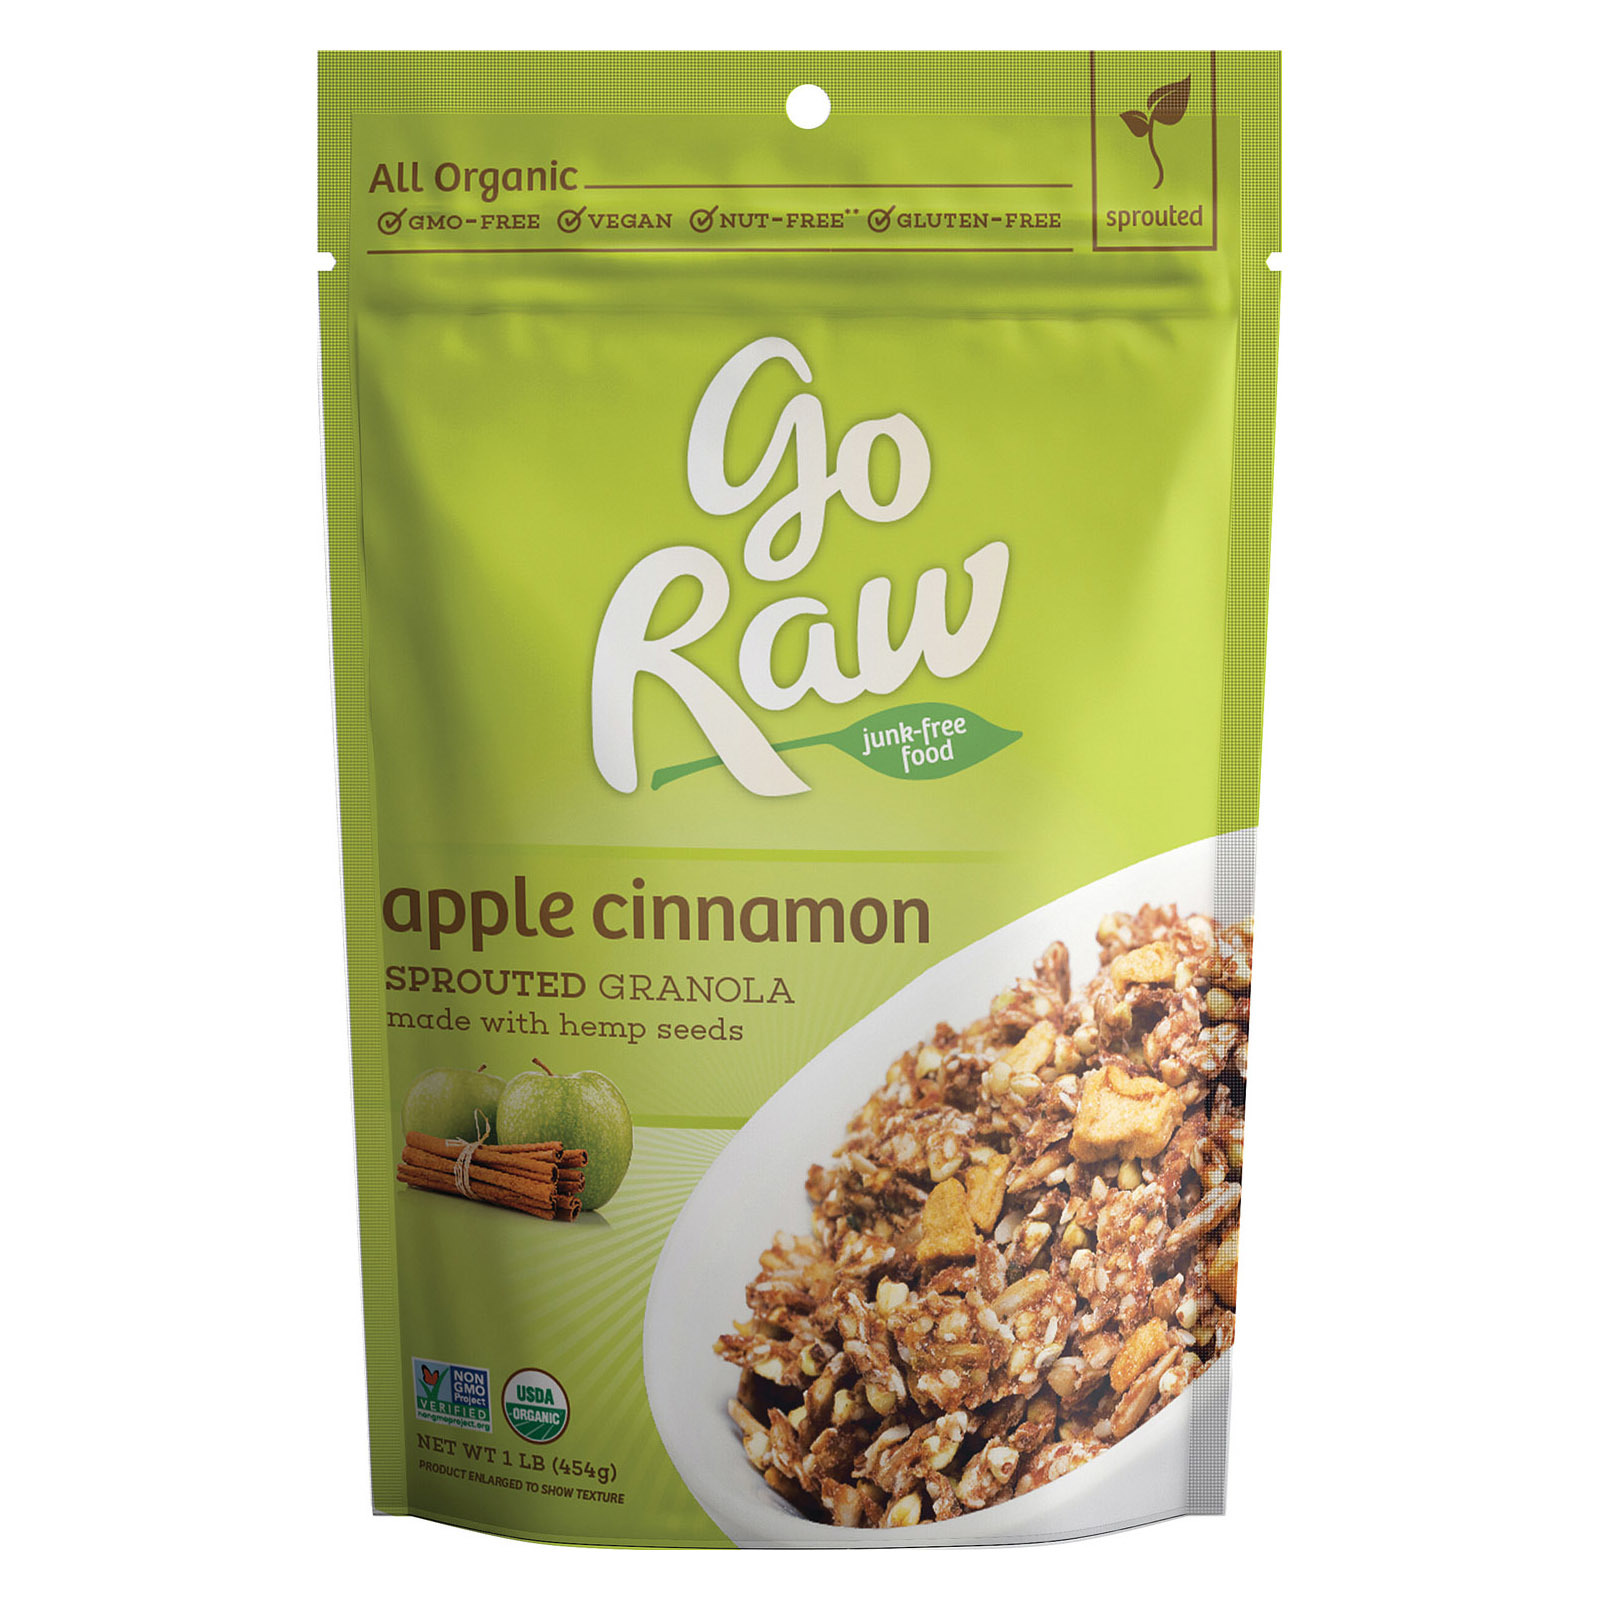 Go Raw Sprouted Granola - Apple Cinnamon - Case of 6 - 16 oz.